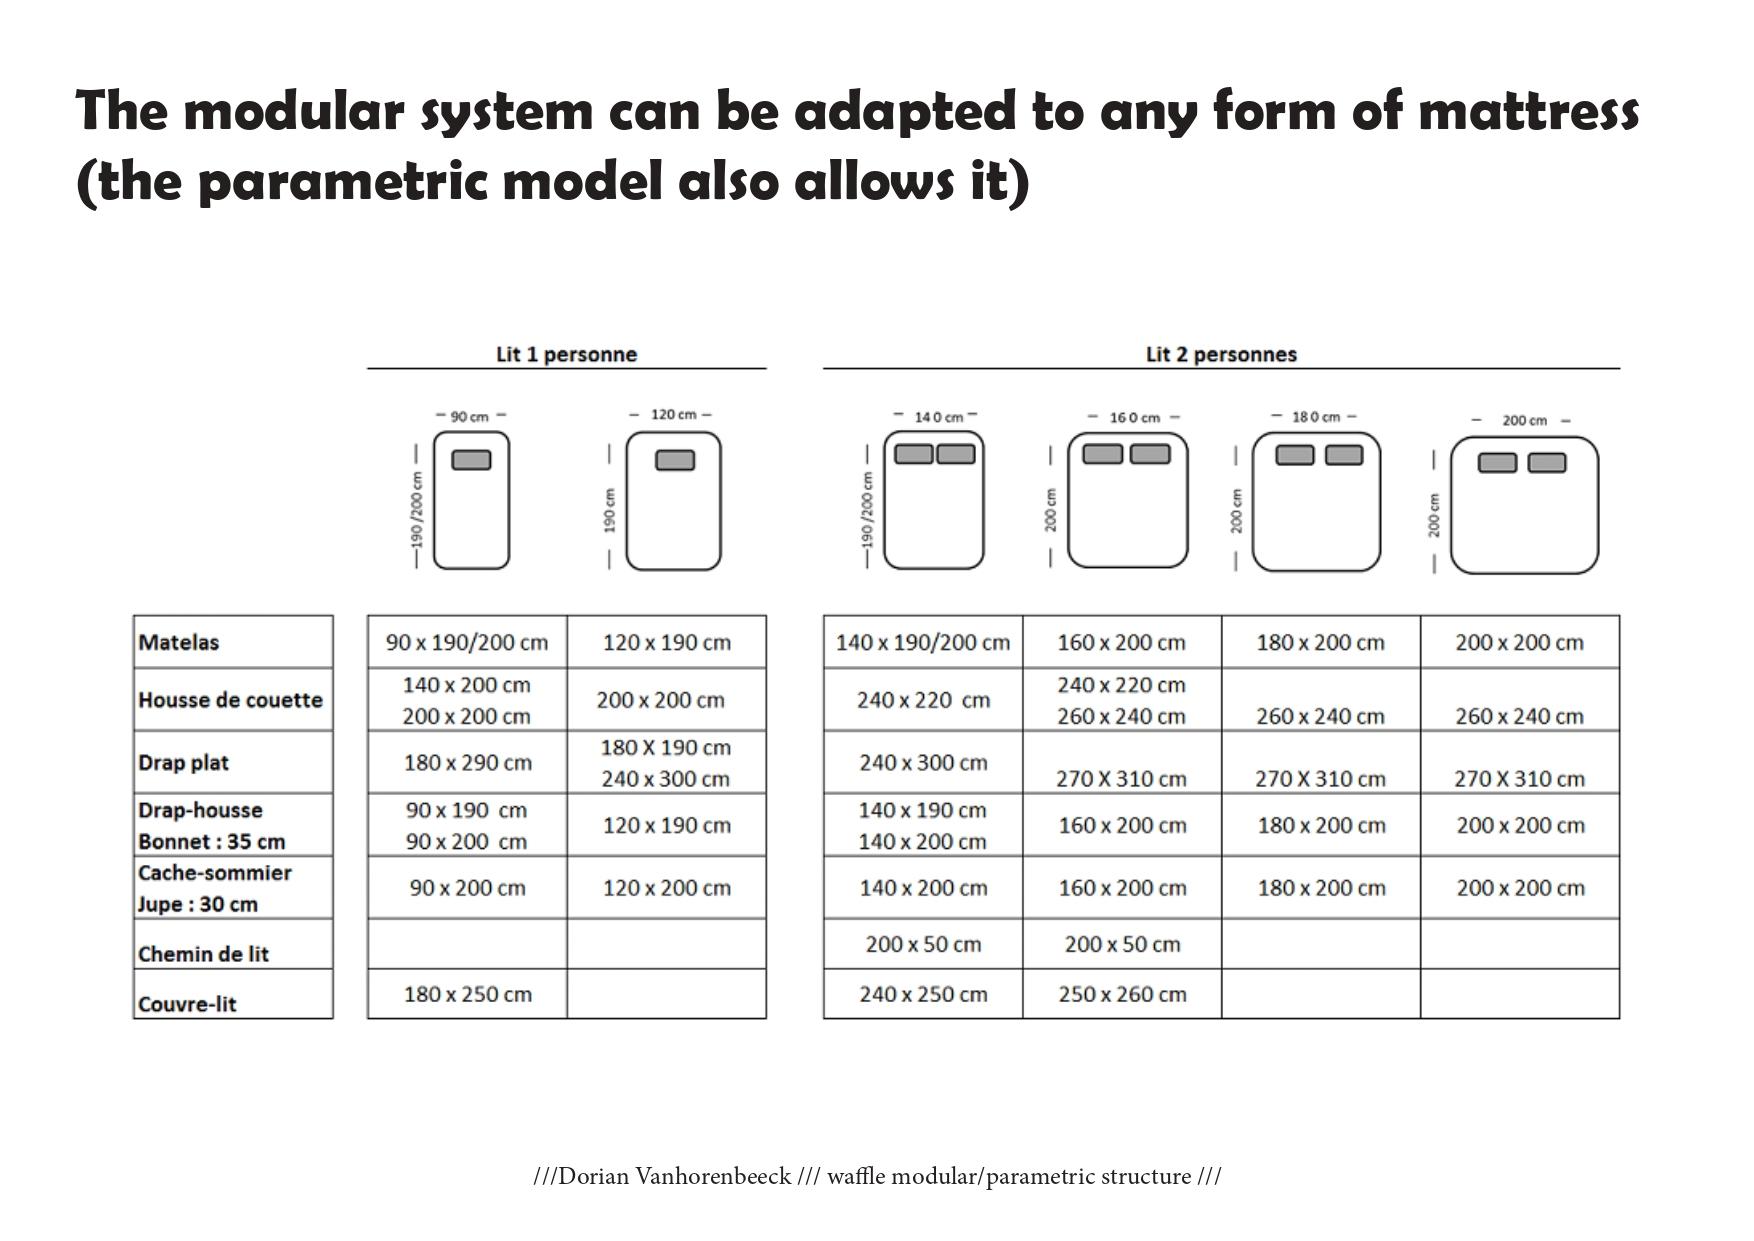 Livret Waffle modular-parametric Structure Dorian Vanhorenbeeck_page-0007